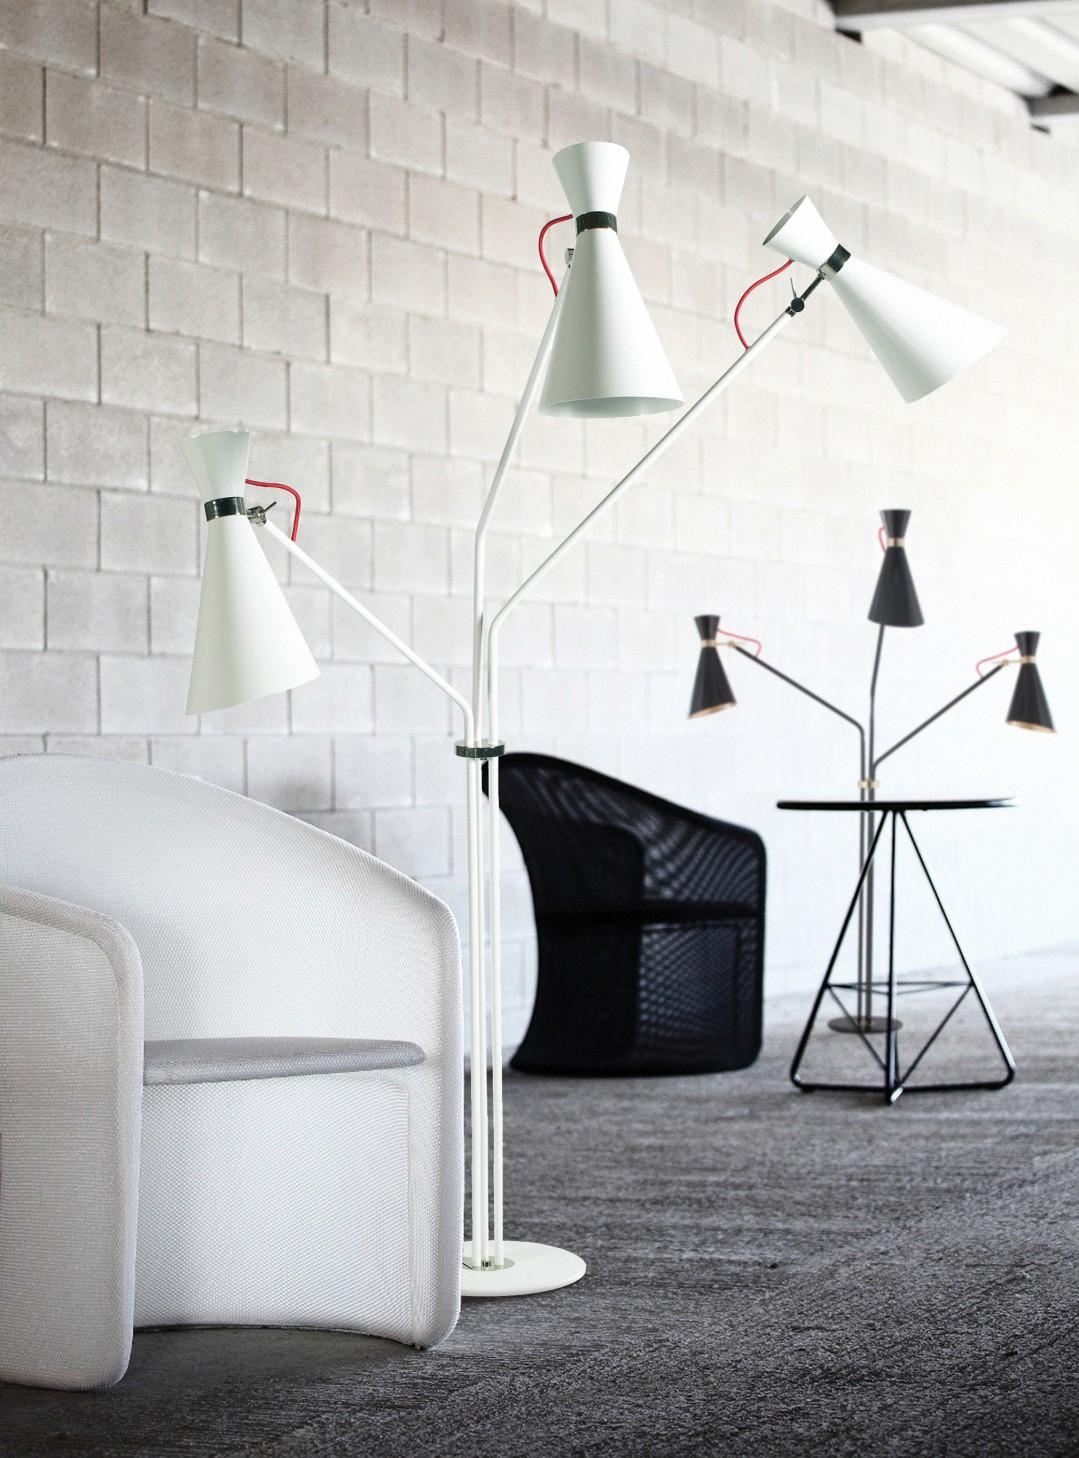 Simone Floor Lamp simone floor lamp Enter In The Jazzy World  Of Simone Floor Lamp! EnterIn The Jazzy World Of Simone Floor Lamp5